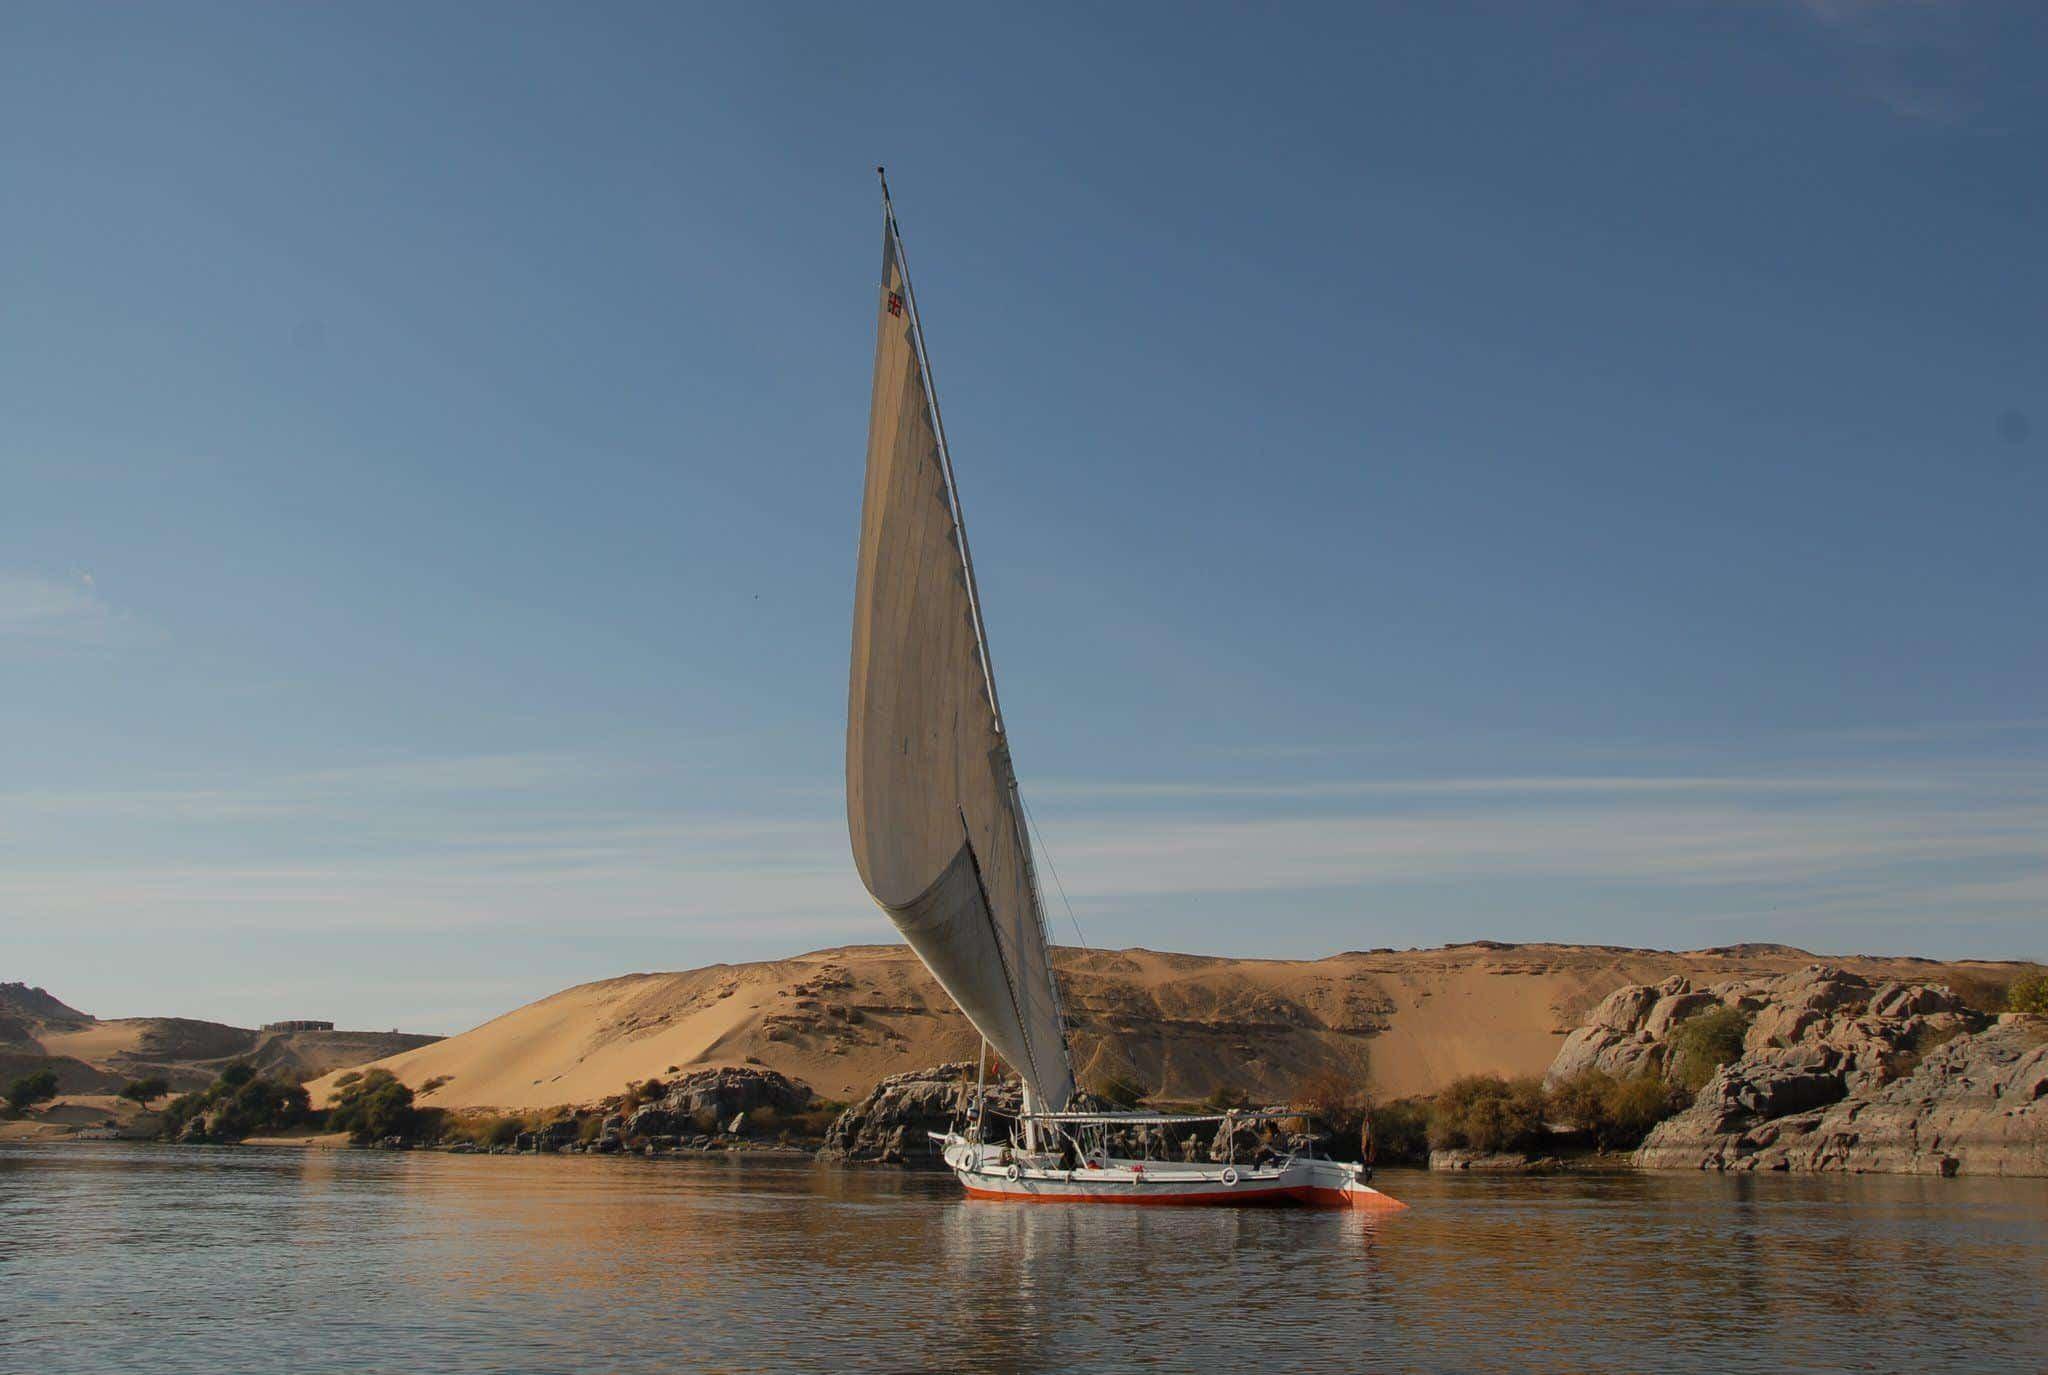 Segeln am Nil in Ägypten